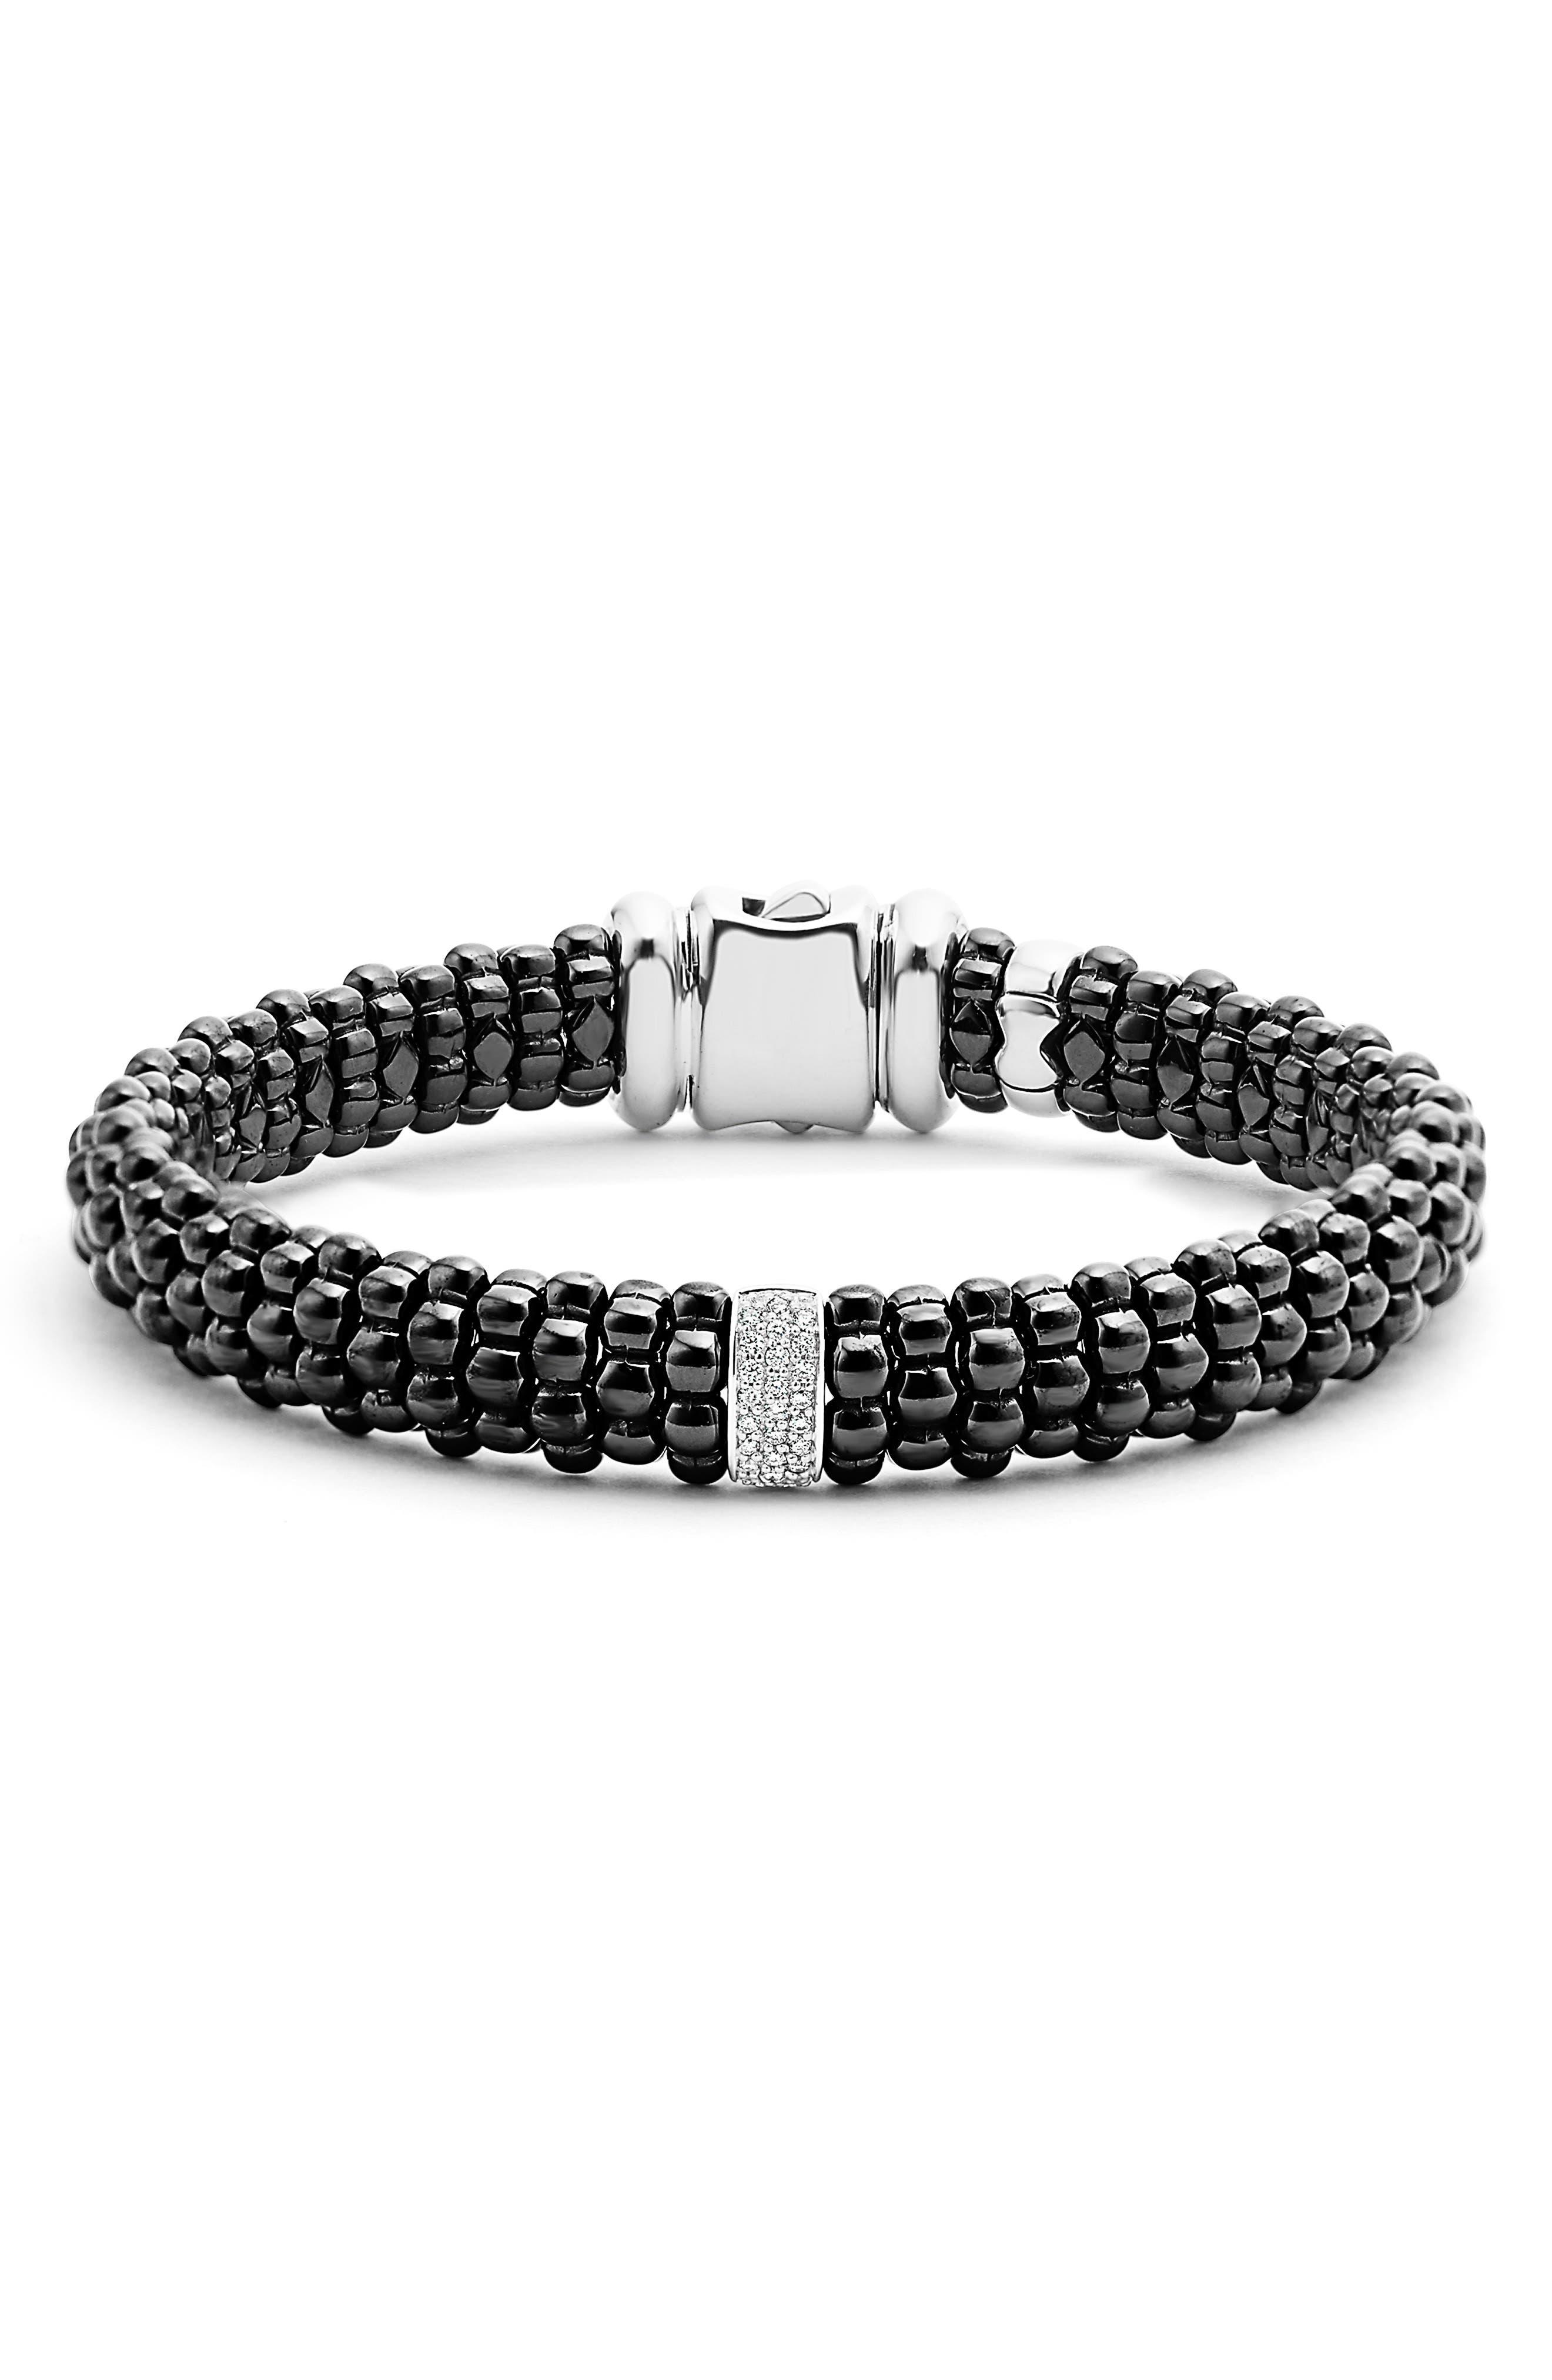 Black Caviar Bracelet,                             Alternate thumbnail 2, color,                             BLACK/ SILVER